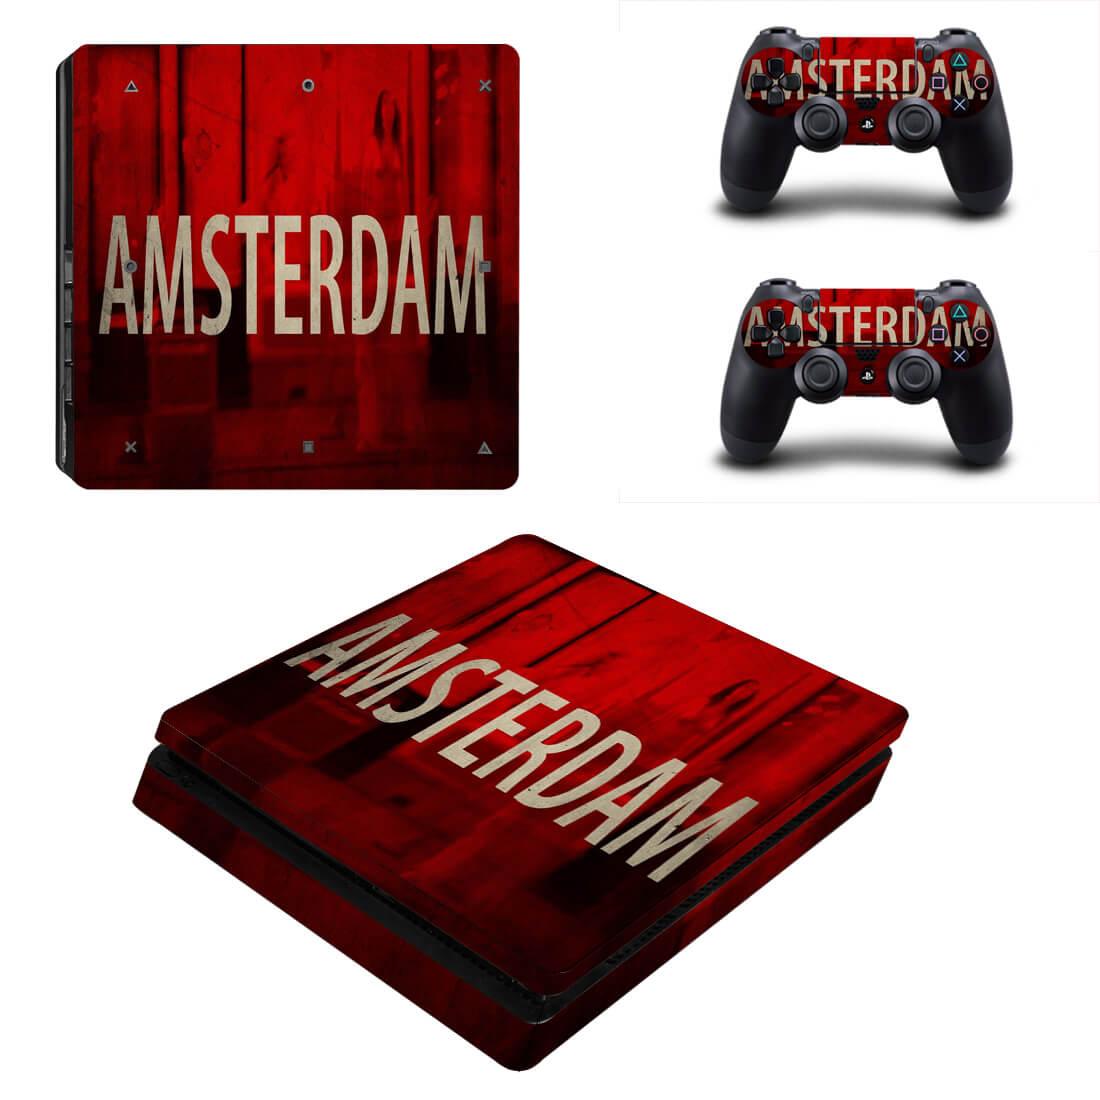 Amsterdam PS4 Slim skin